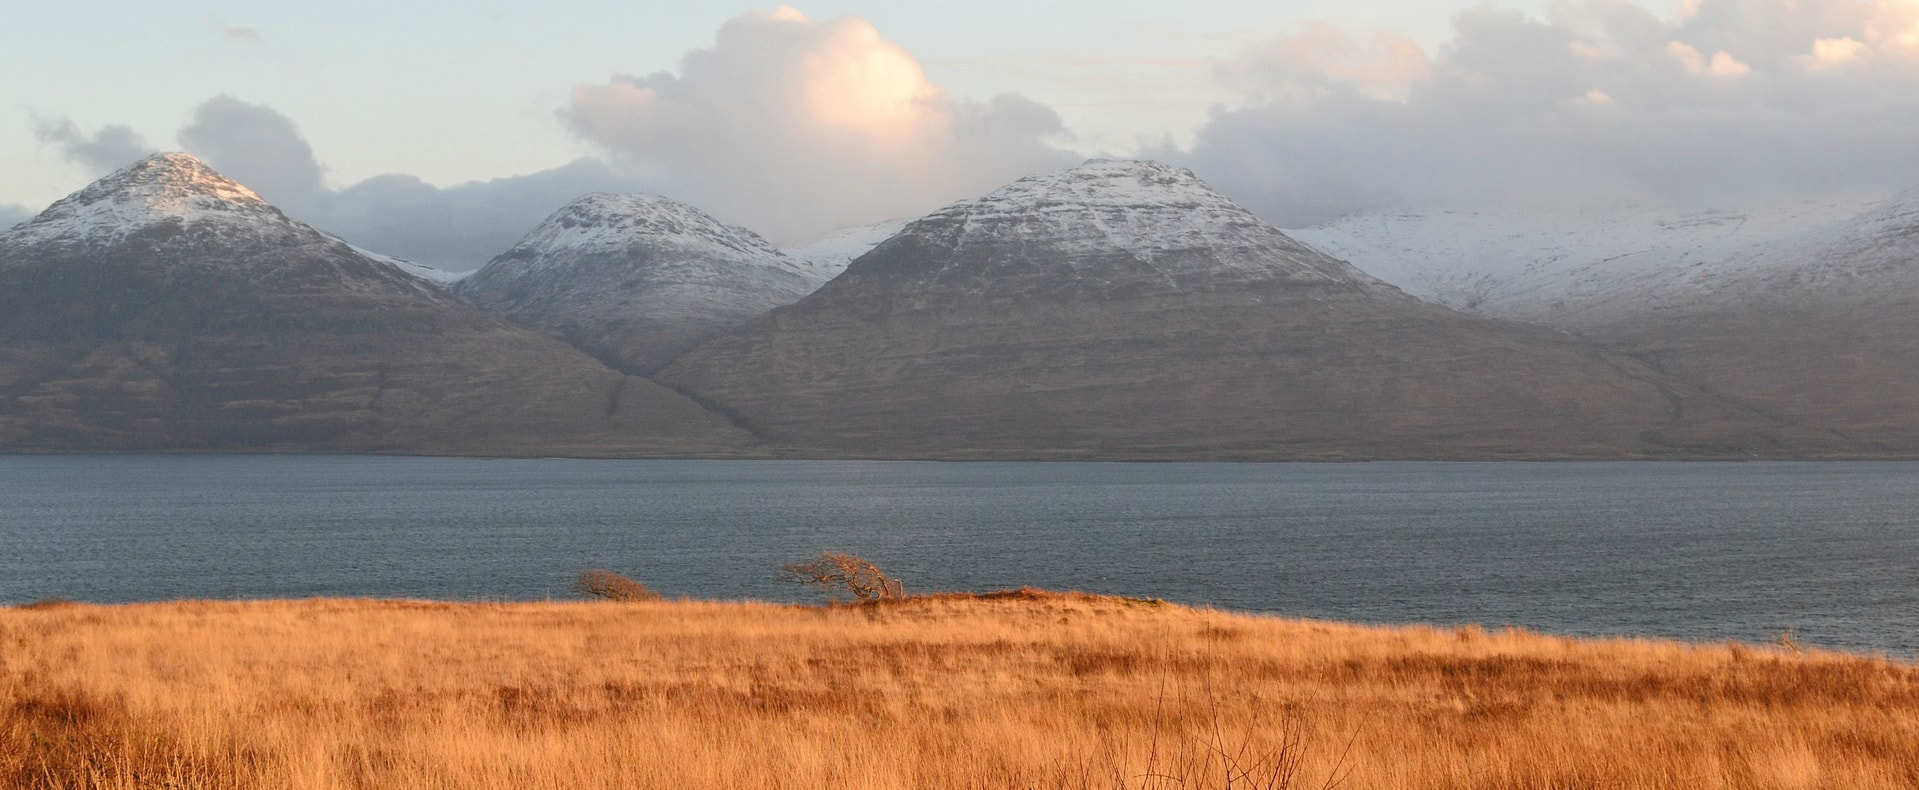 Isle of Mull, Scotland, UK